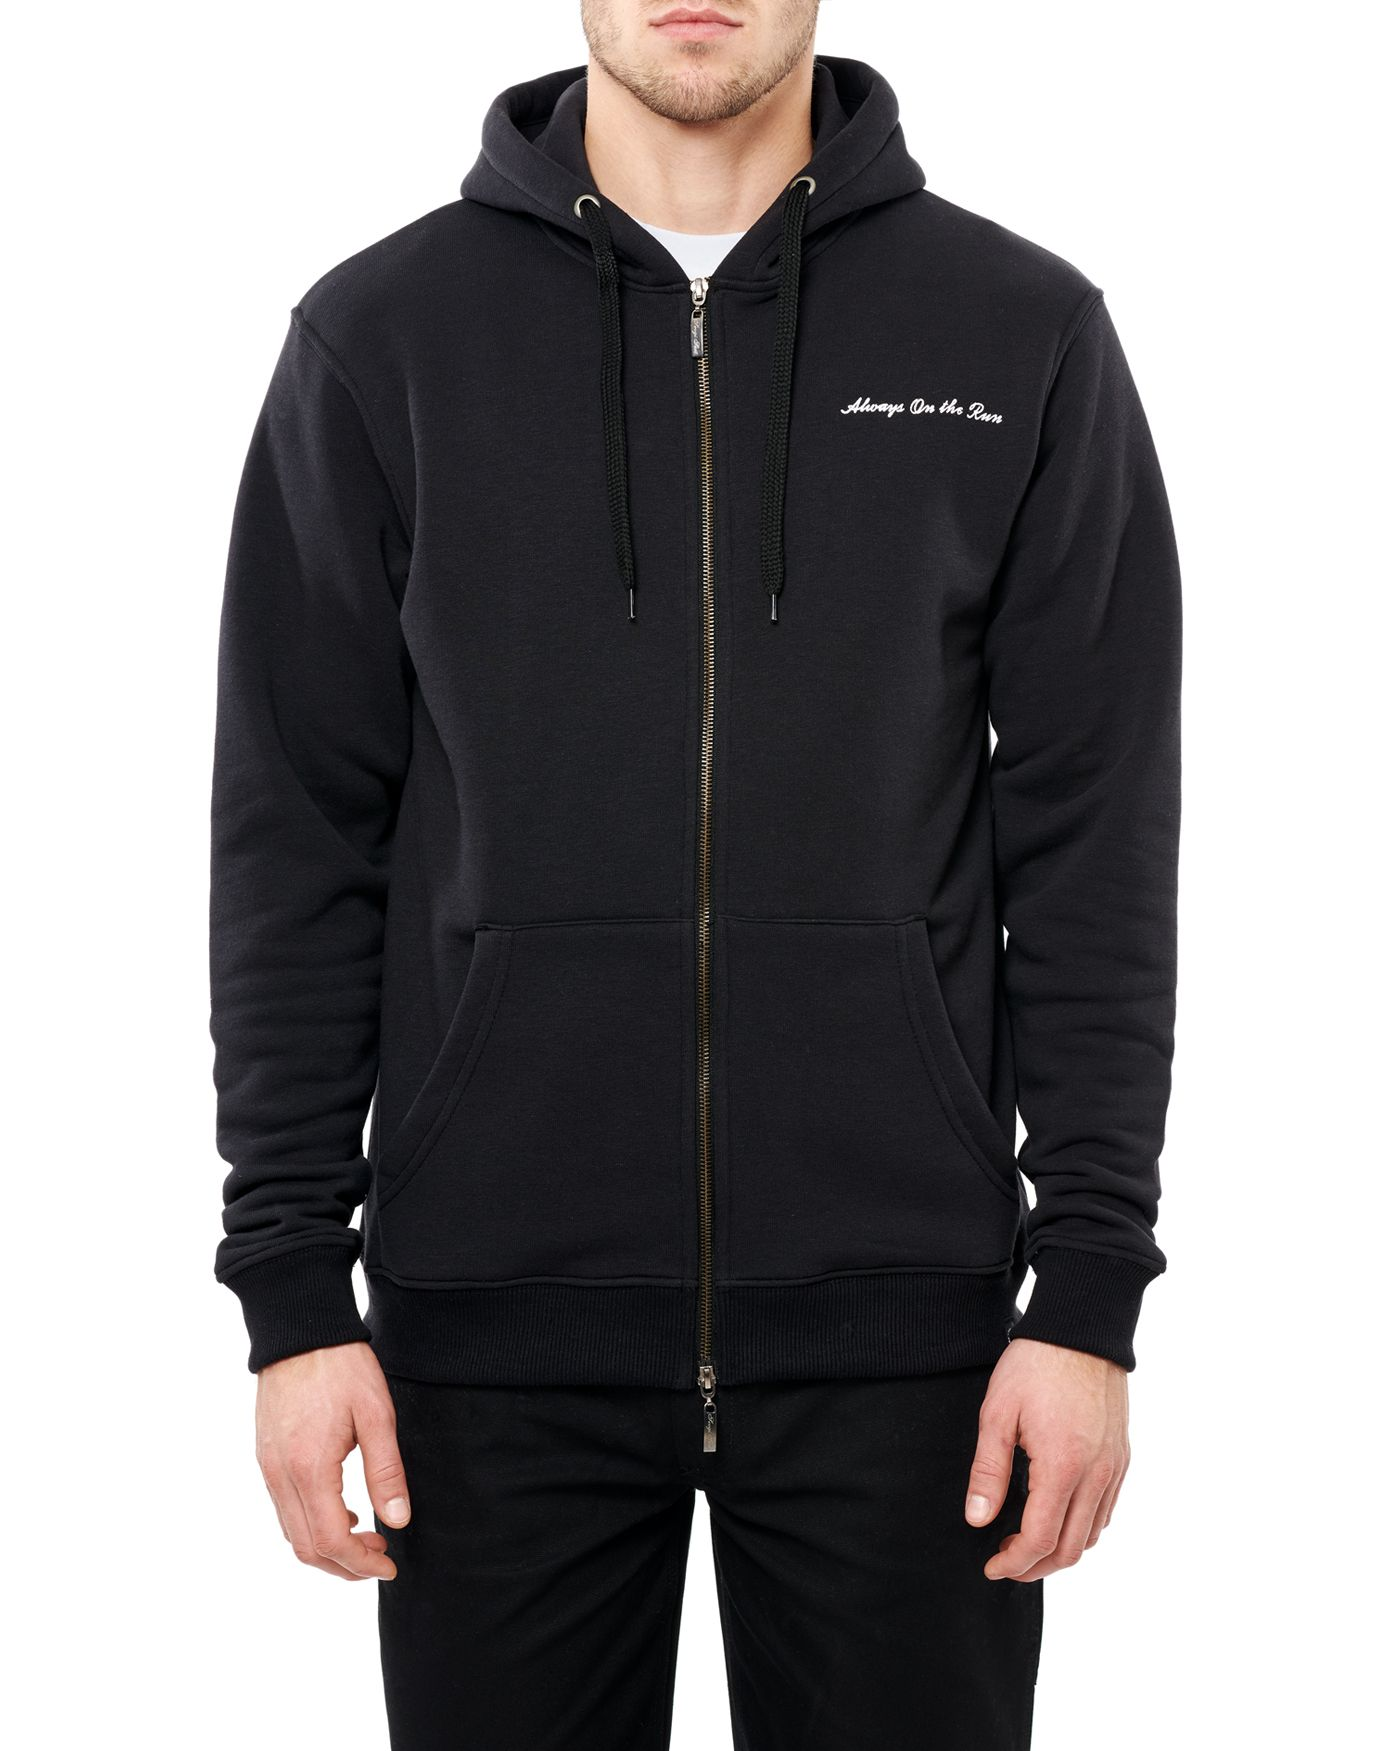 Photo of On the Run Zip Hooded Sweatshirt, Black